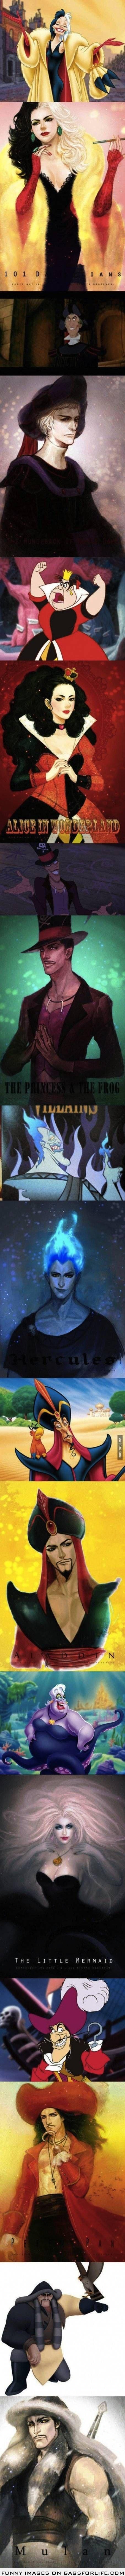 What if disney villains were beautiful